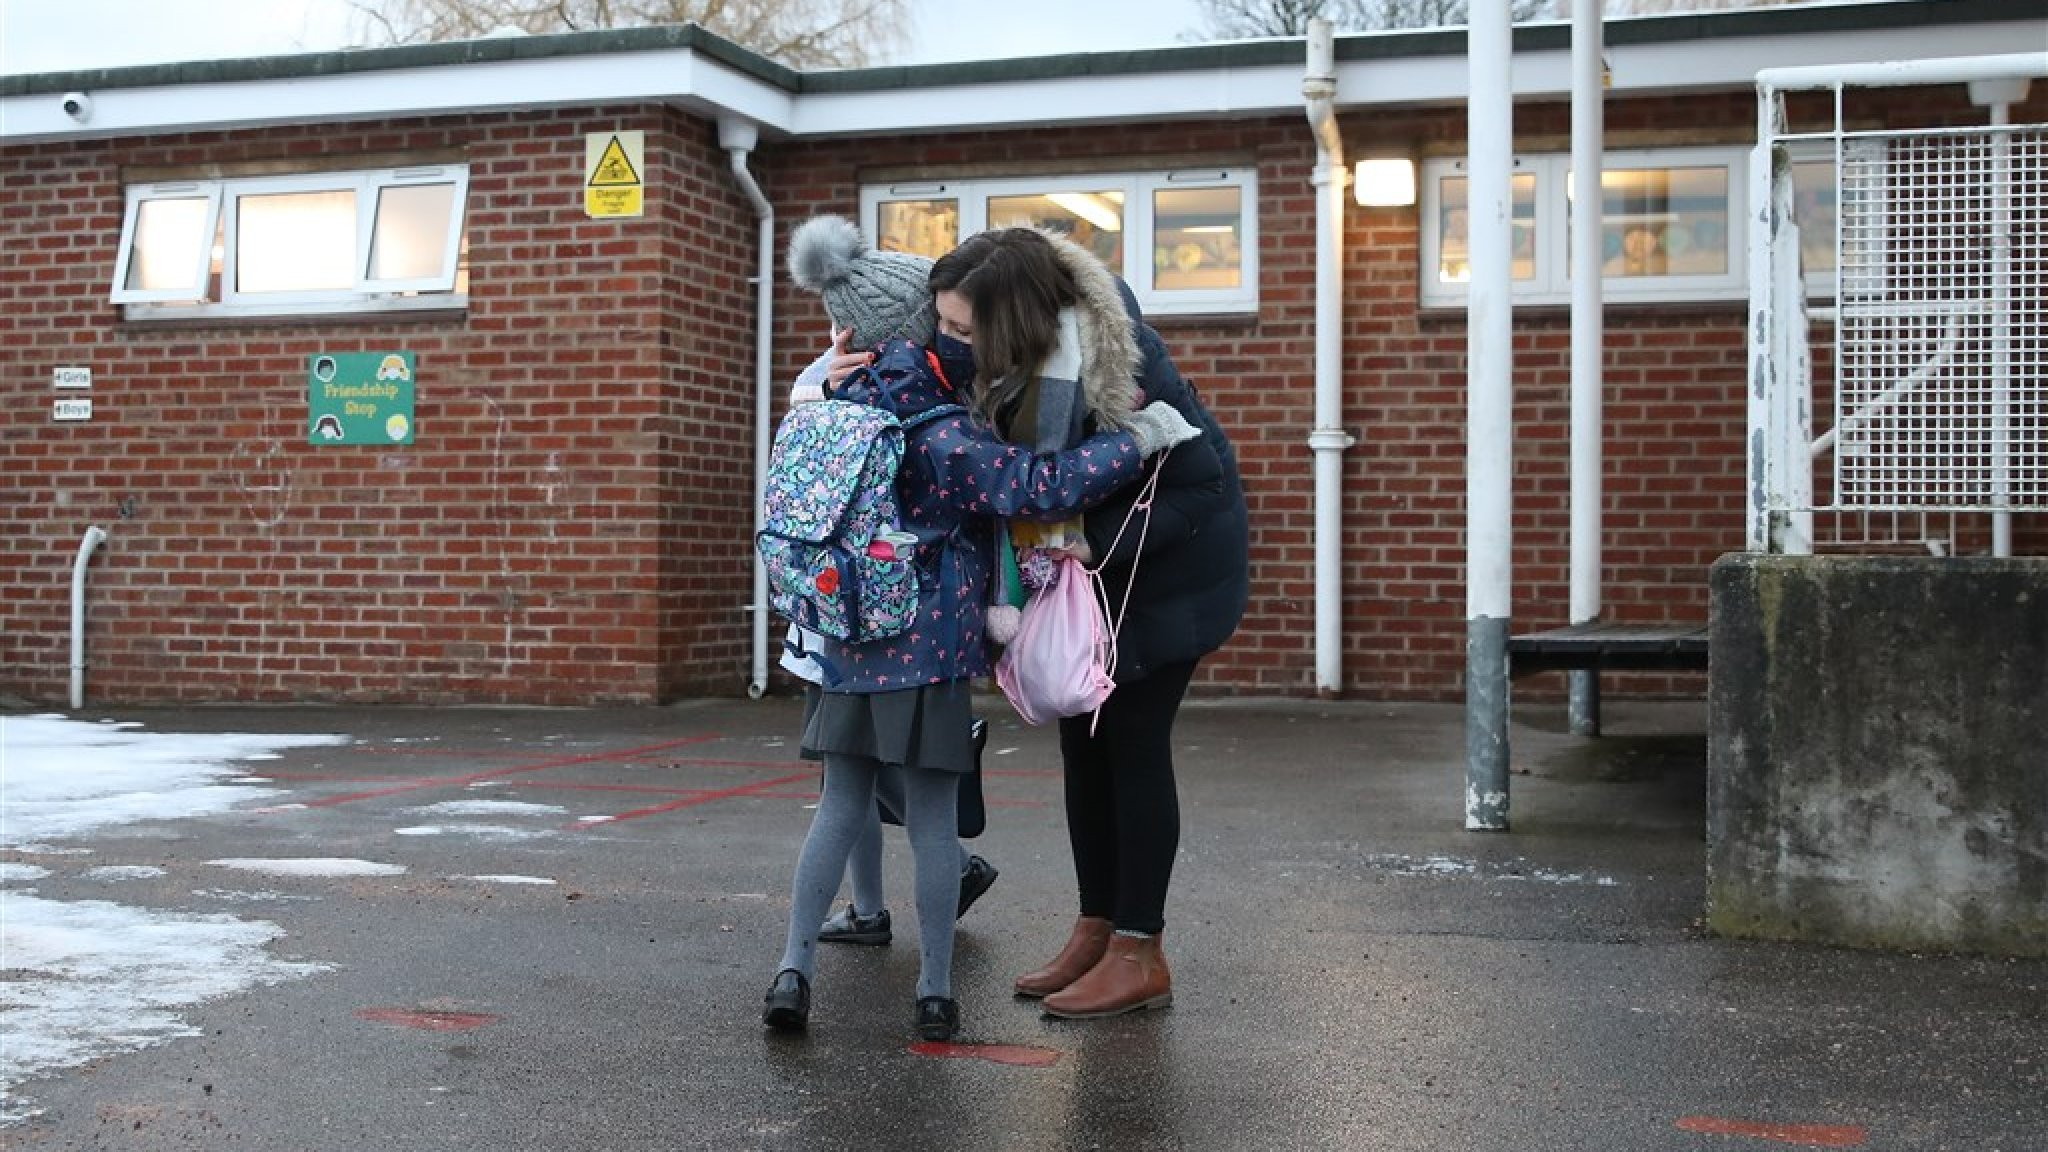 English children continue to attend school despite growing concerns